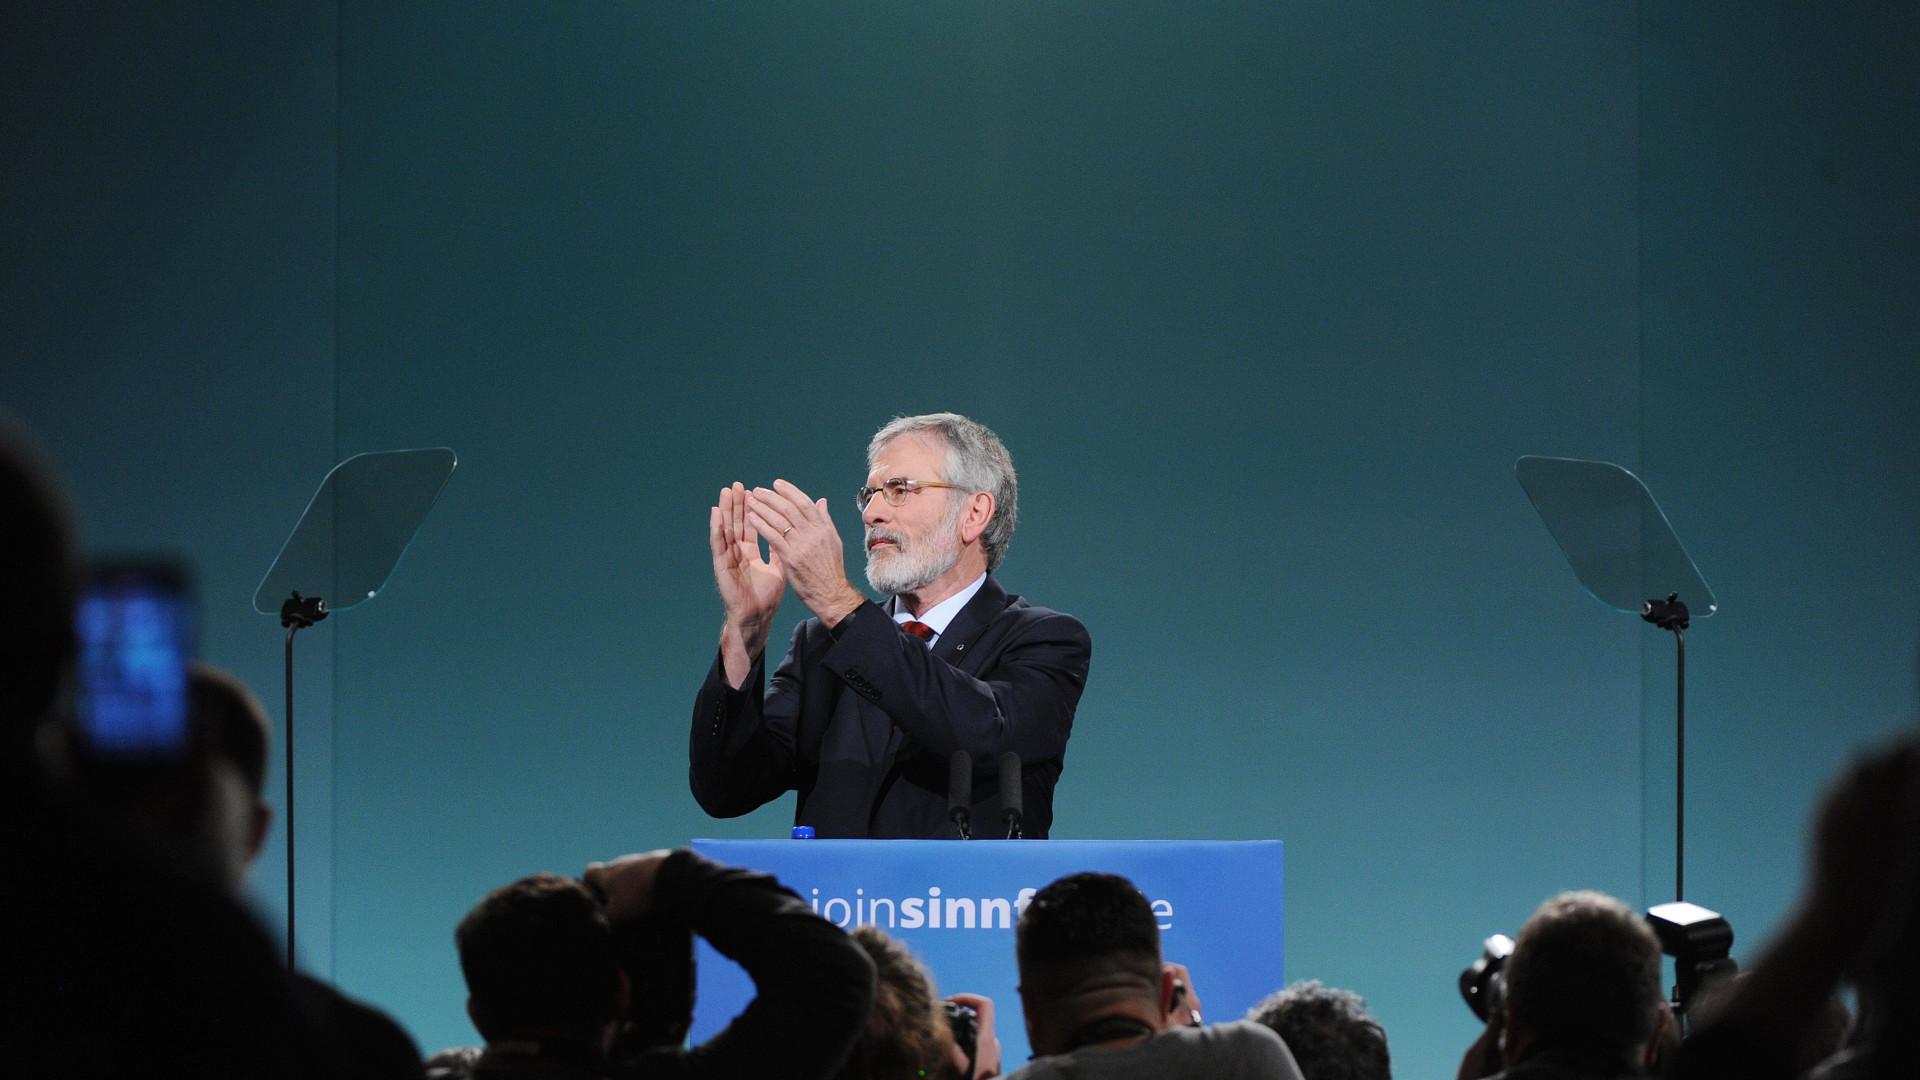 Gerry Adams anuncia que deixará presidência do Sinn Féin em 2018